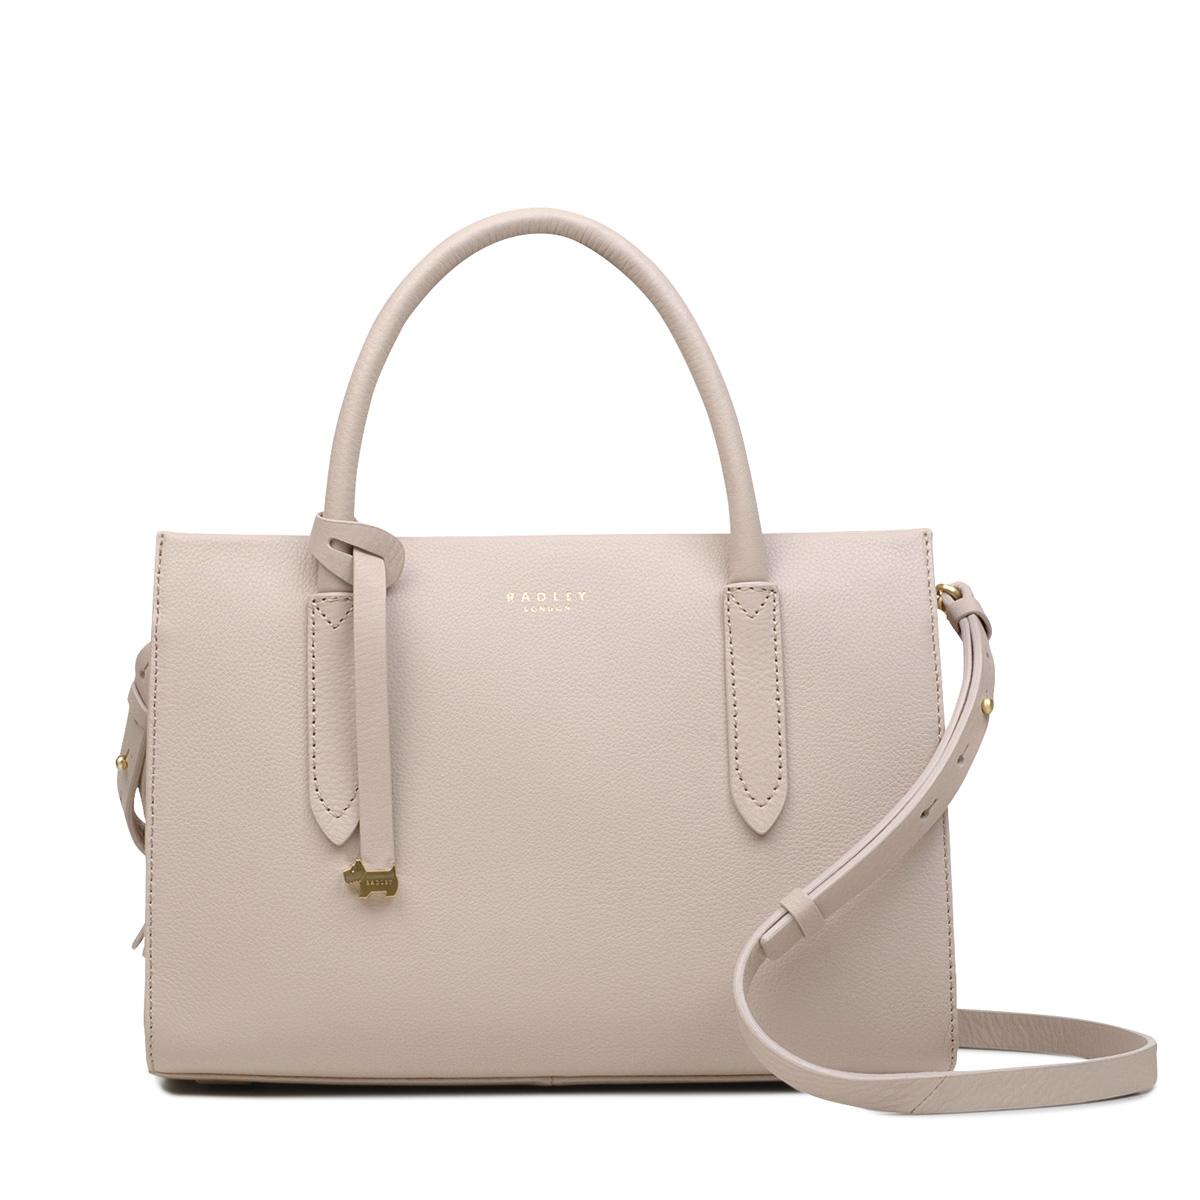 7af534df4756 Handbags And Purses